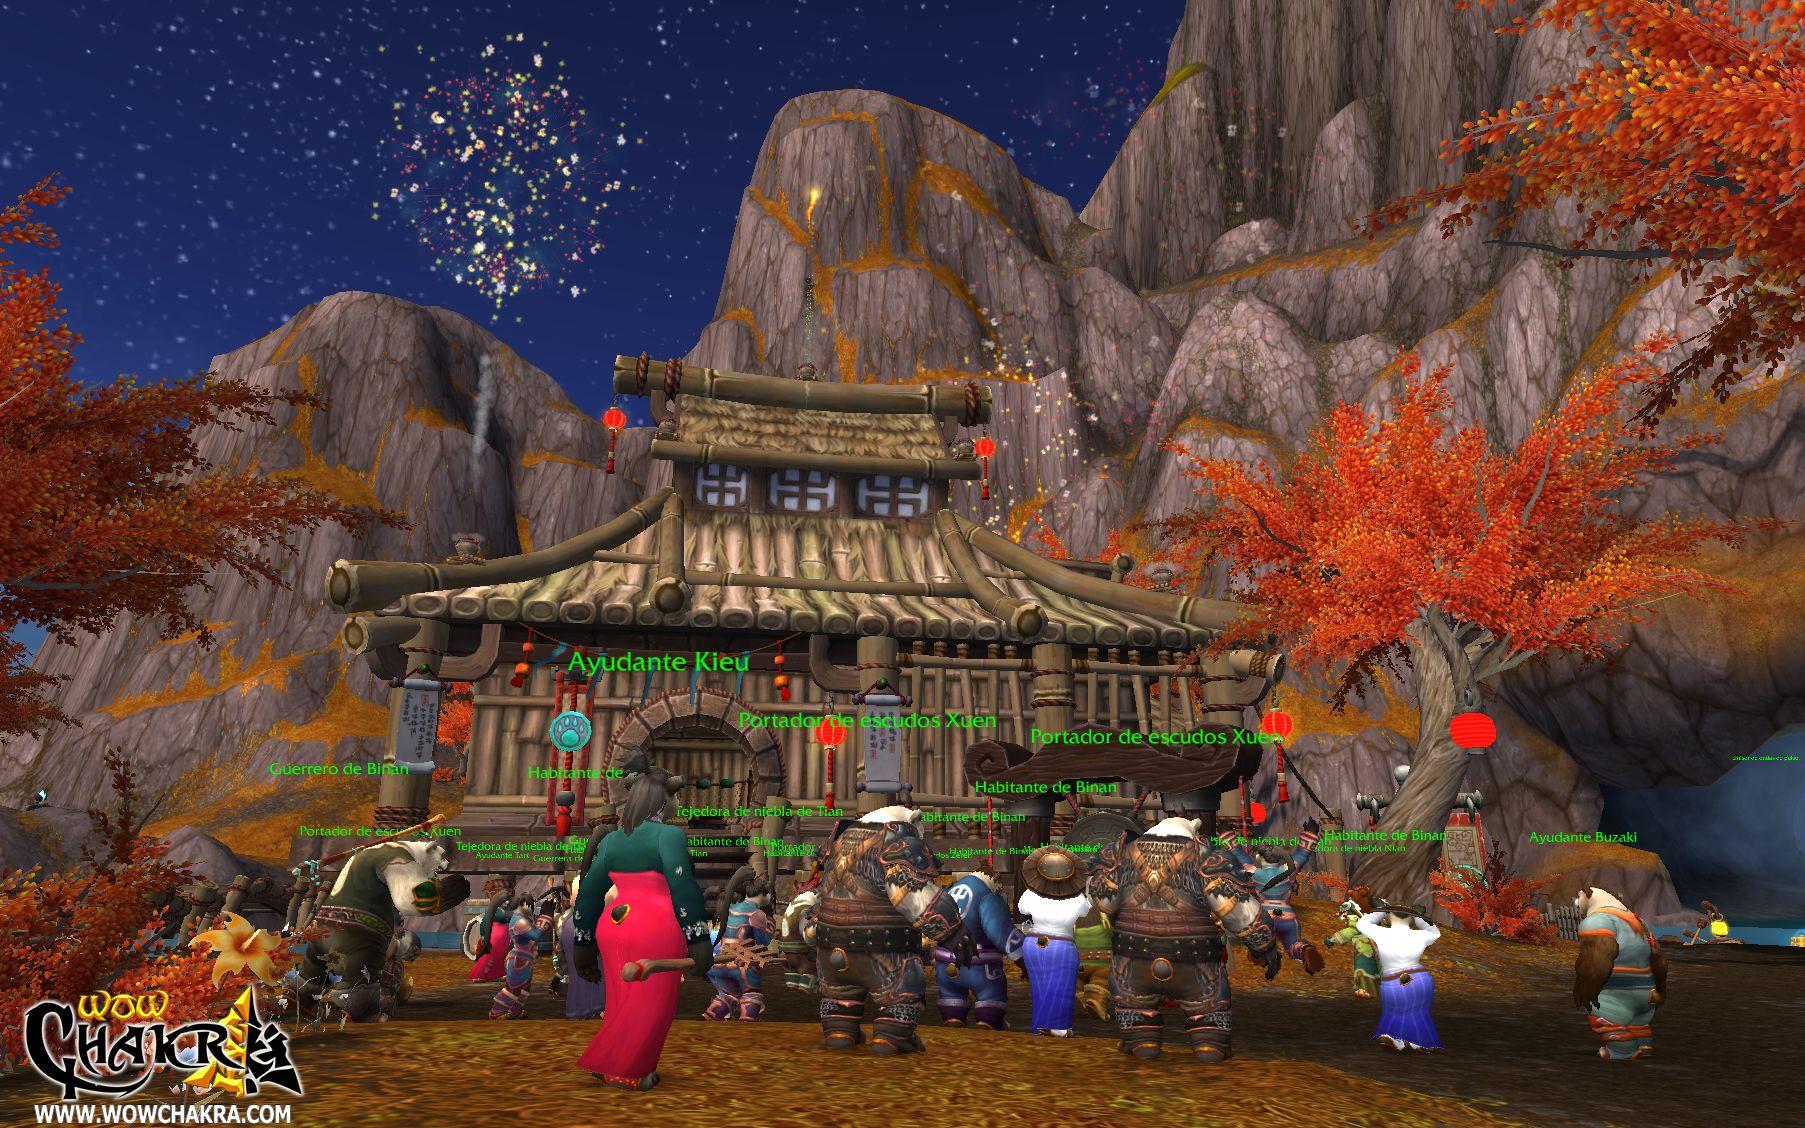 Gesta: Festival de la Cerveza Lunar